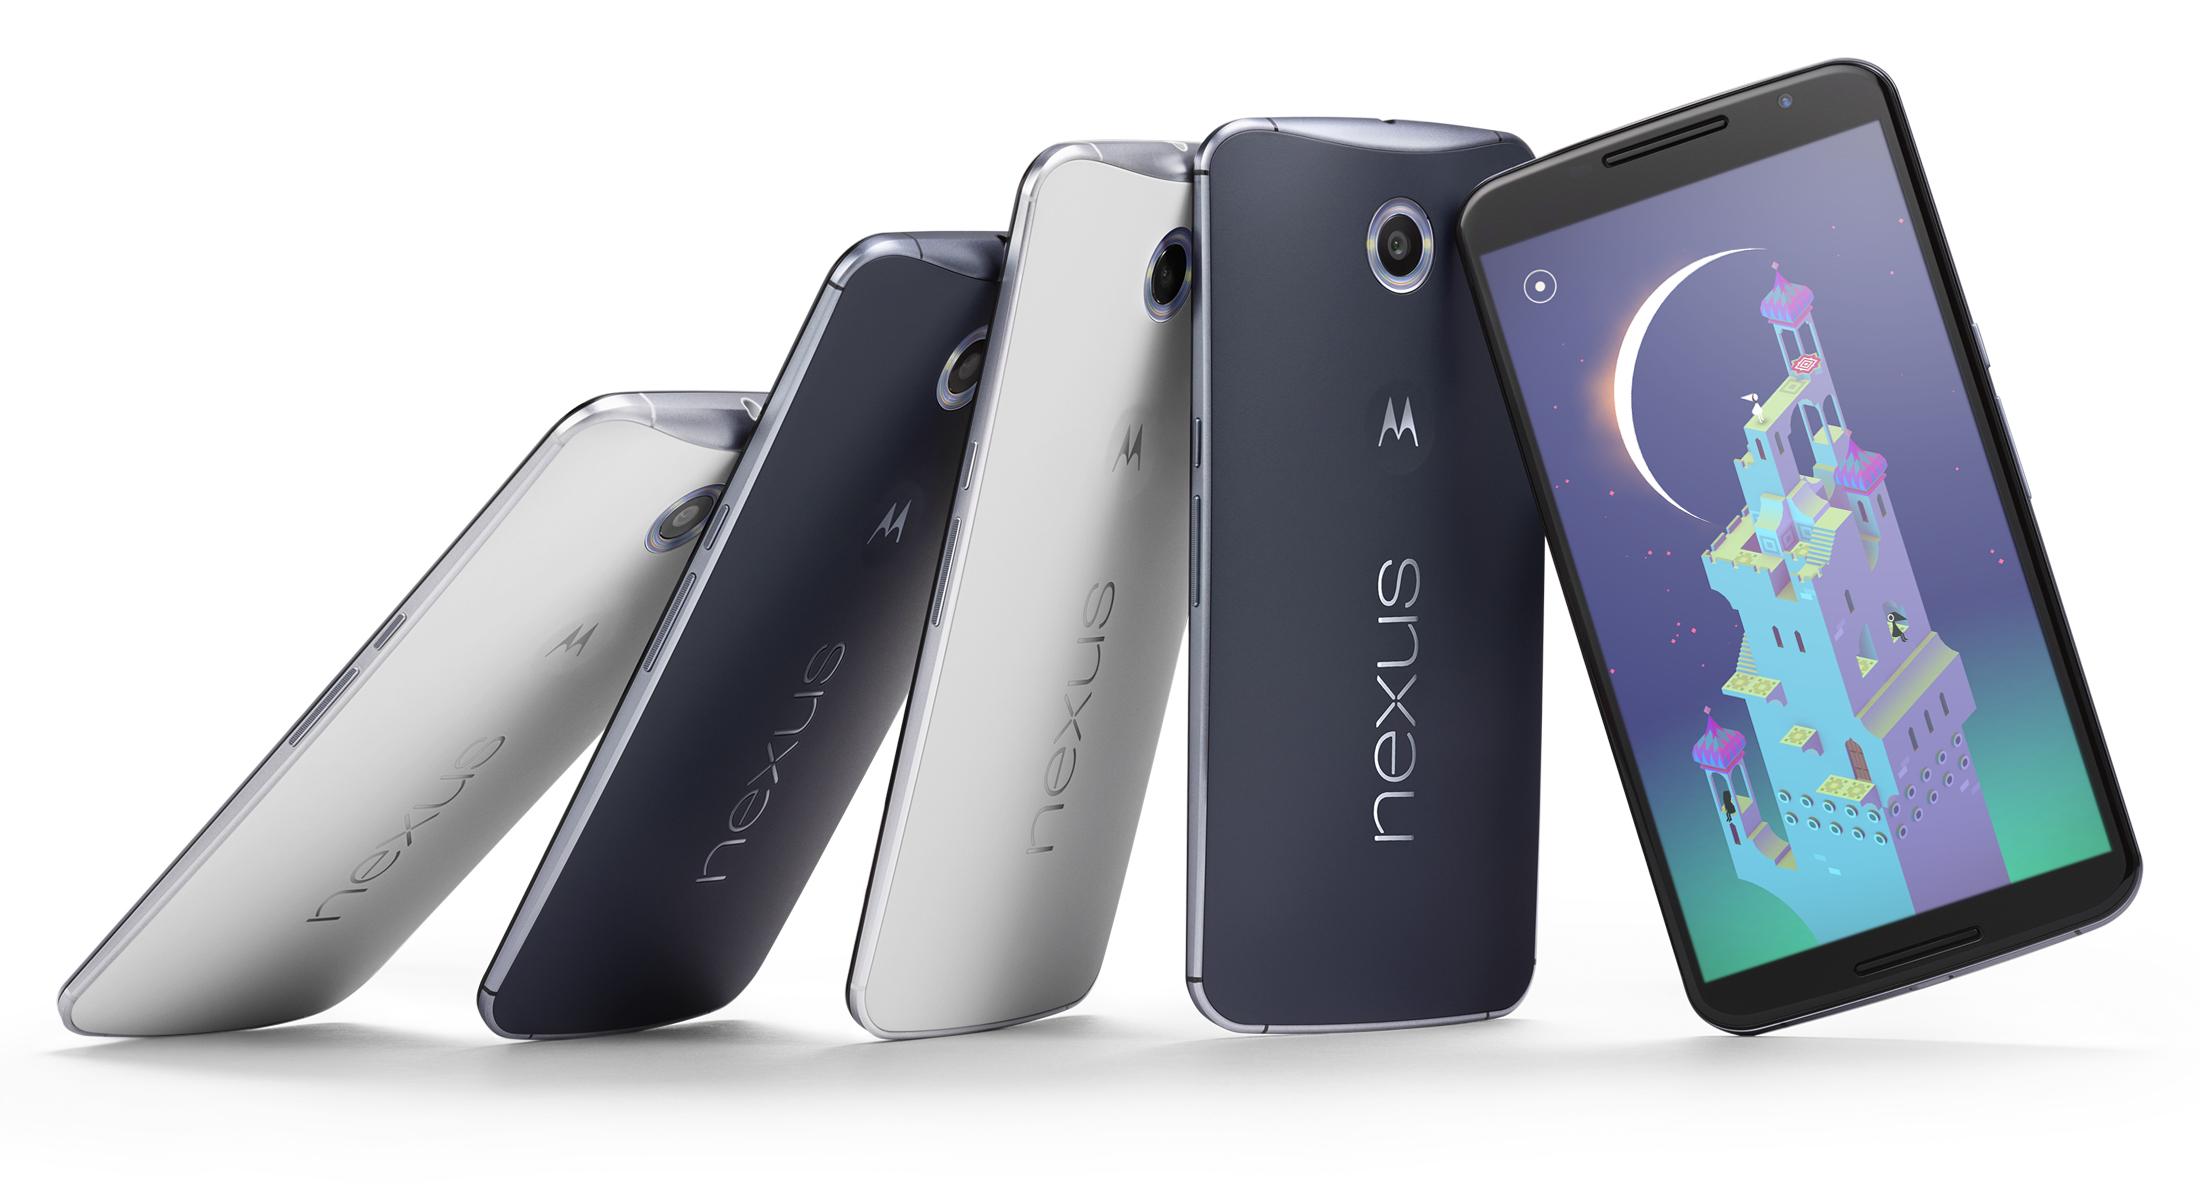 LG G4 versus Google Nexus 6 1